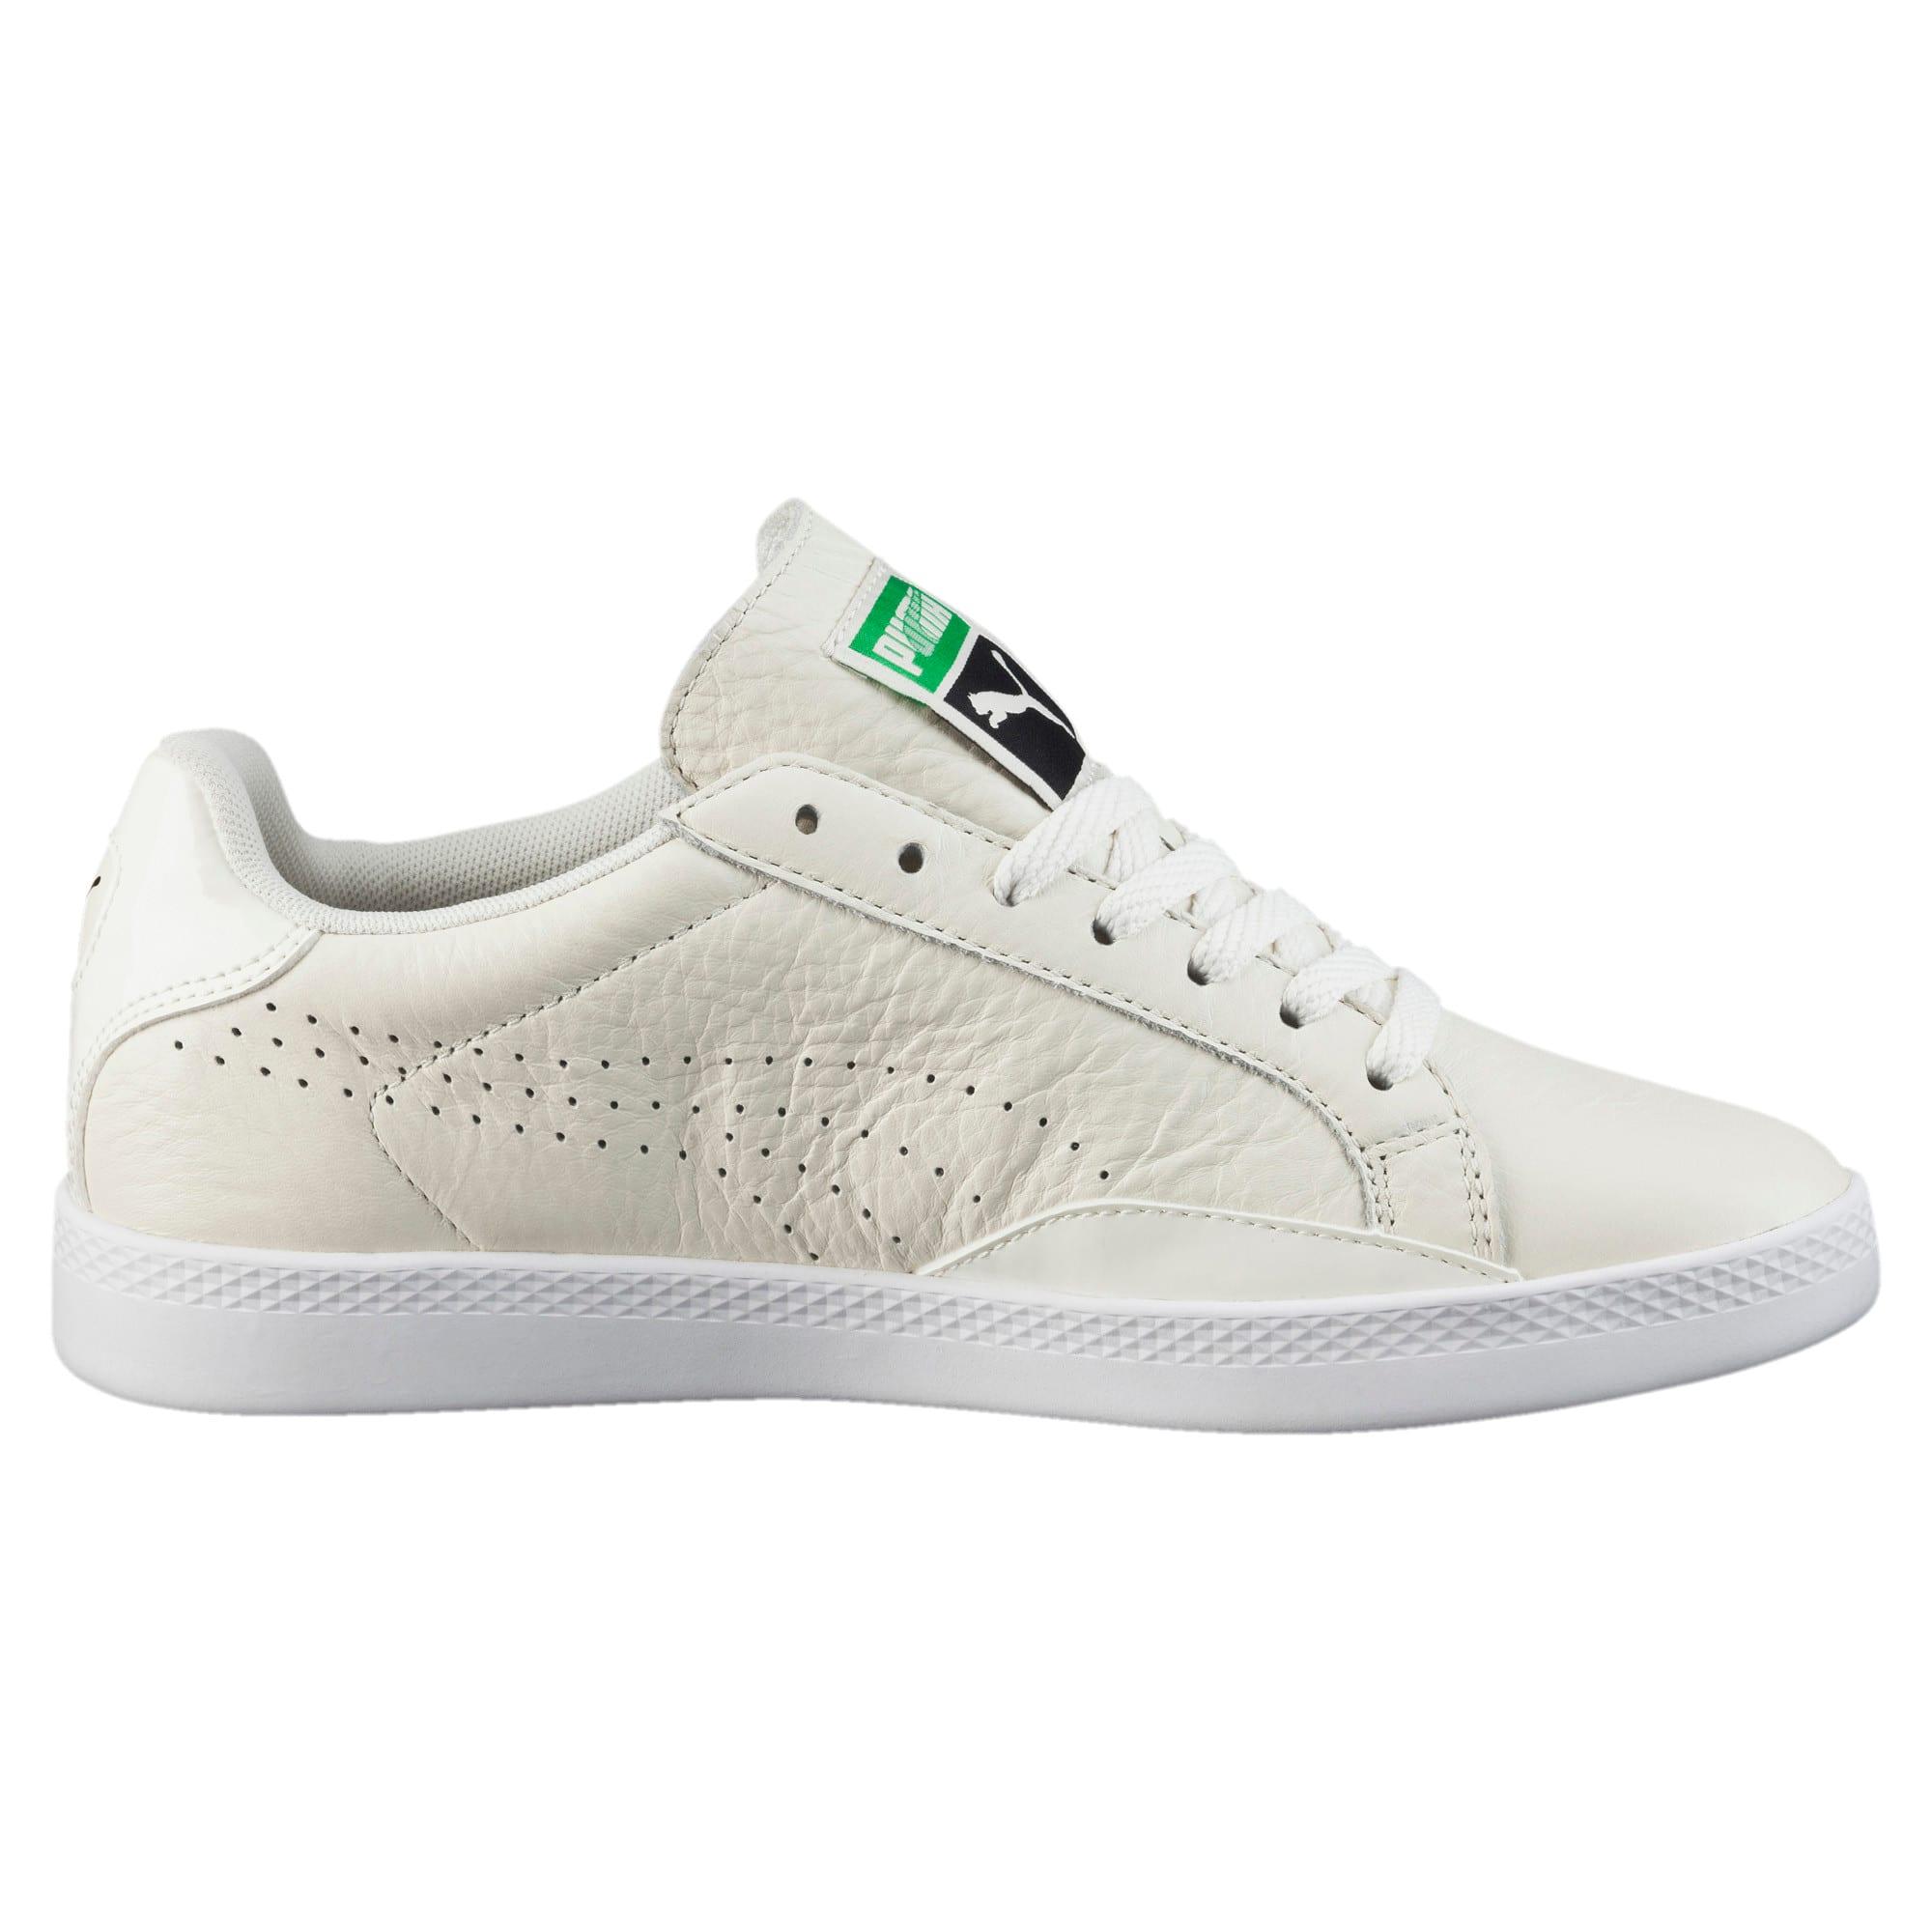 Thumbnail 3 of Match Women's Sneakers, marshmallow-white, medium